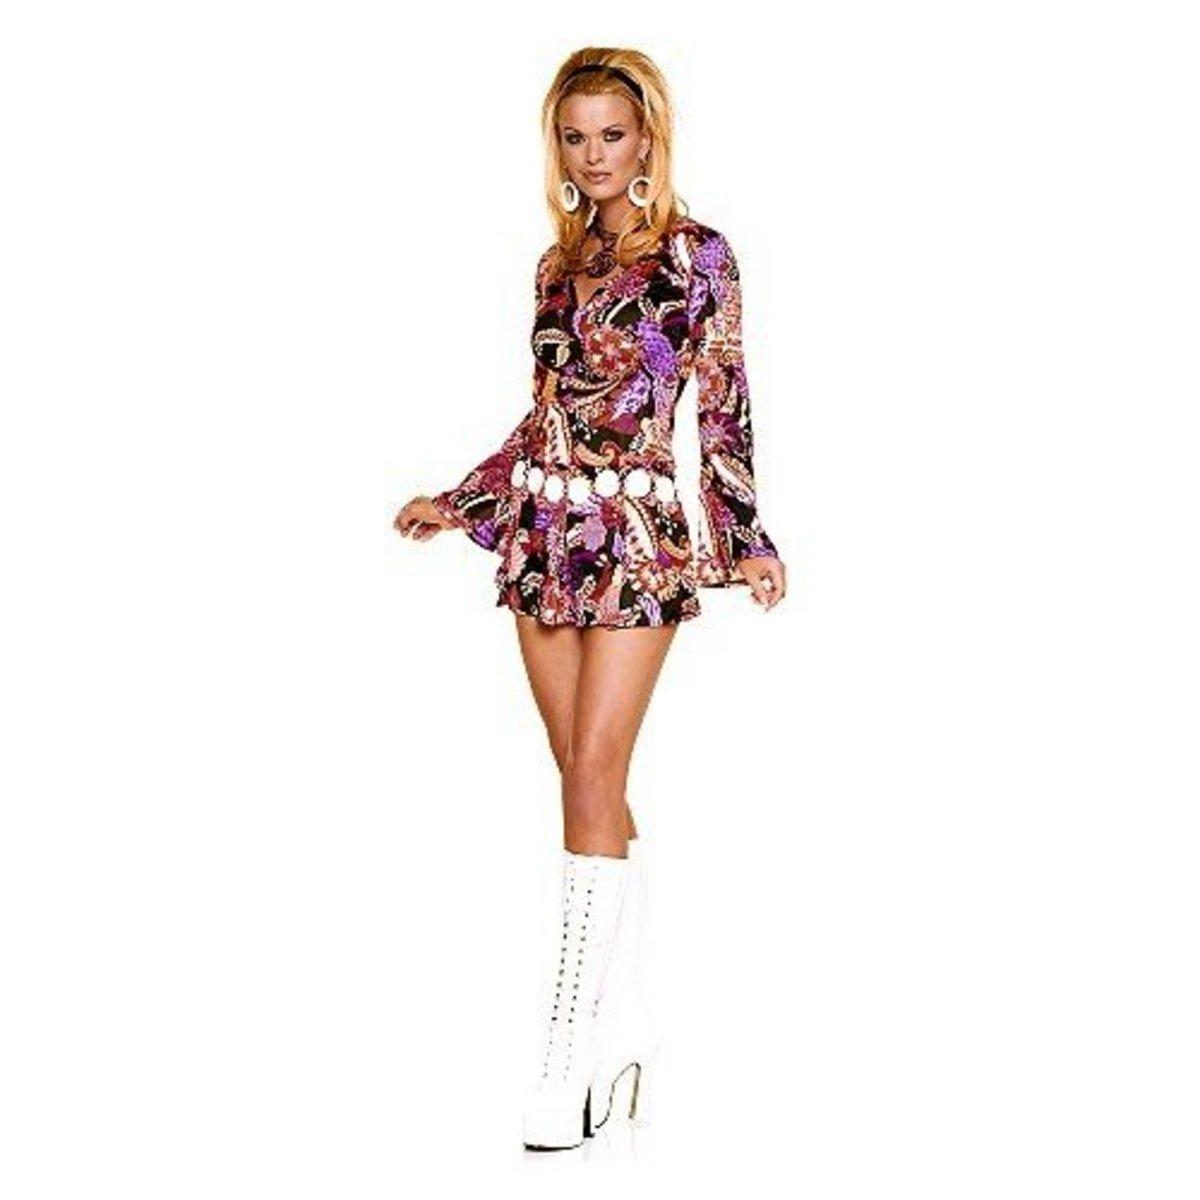 A vast majority of 'Disco Wear' was in fact professional dancing gear.